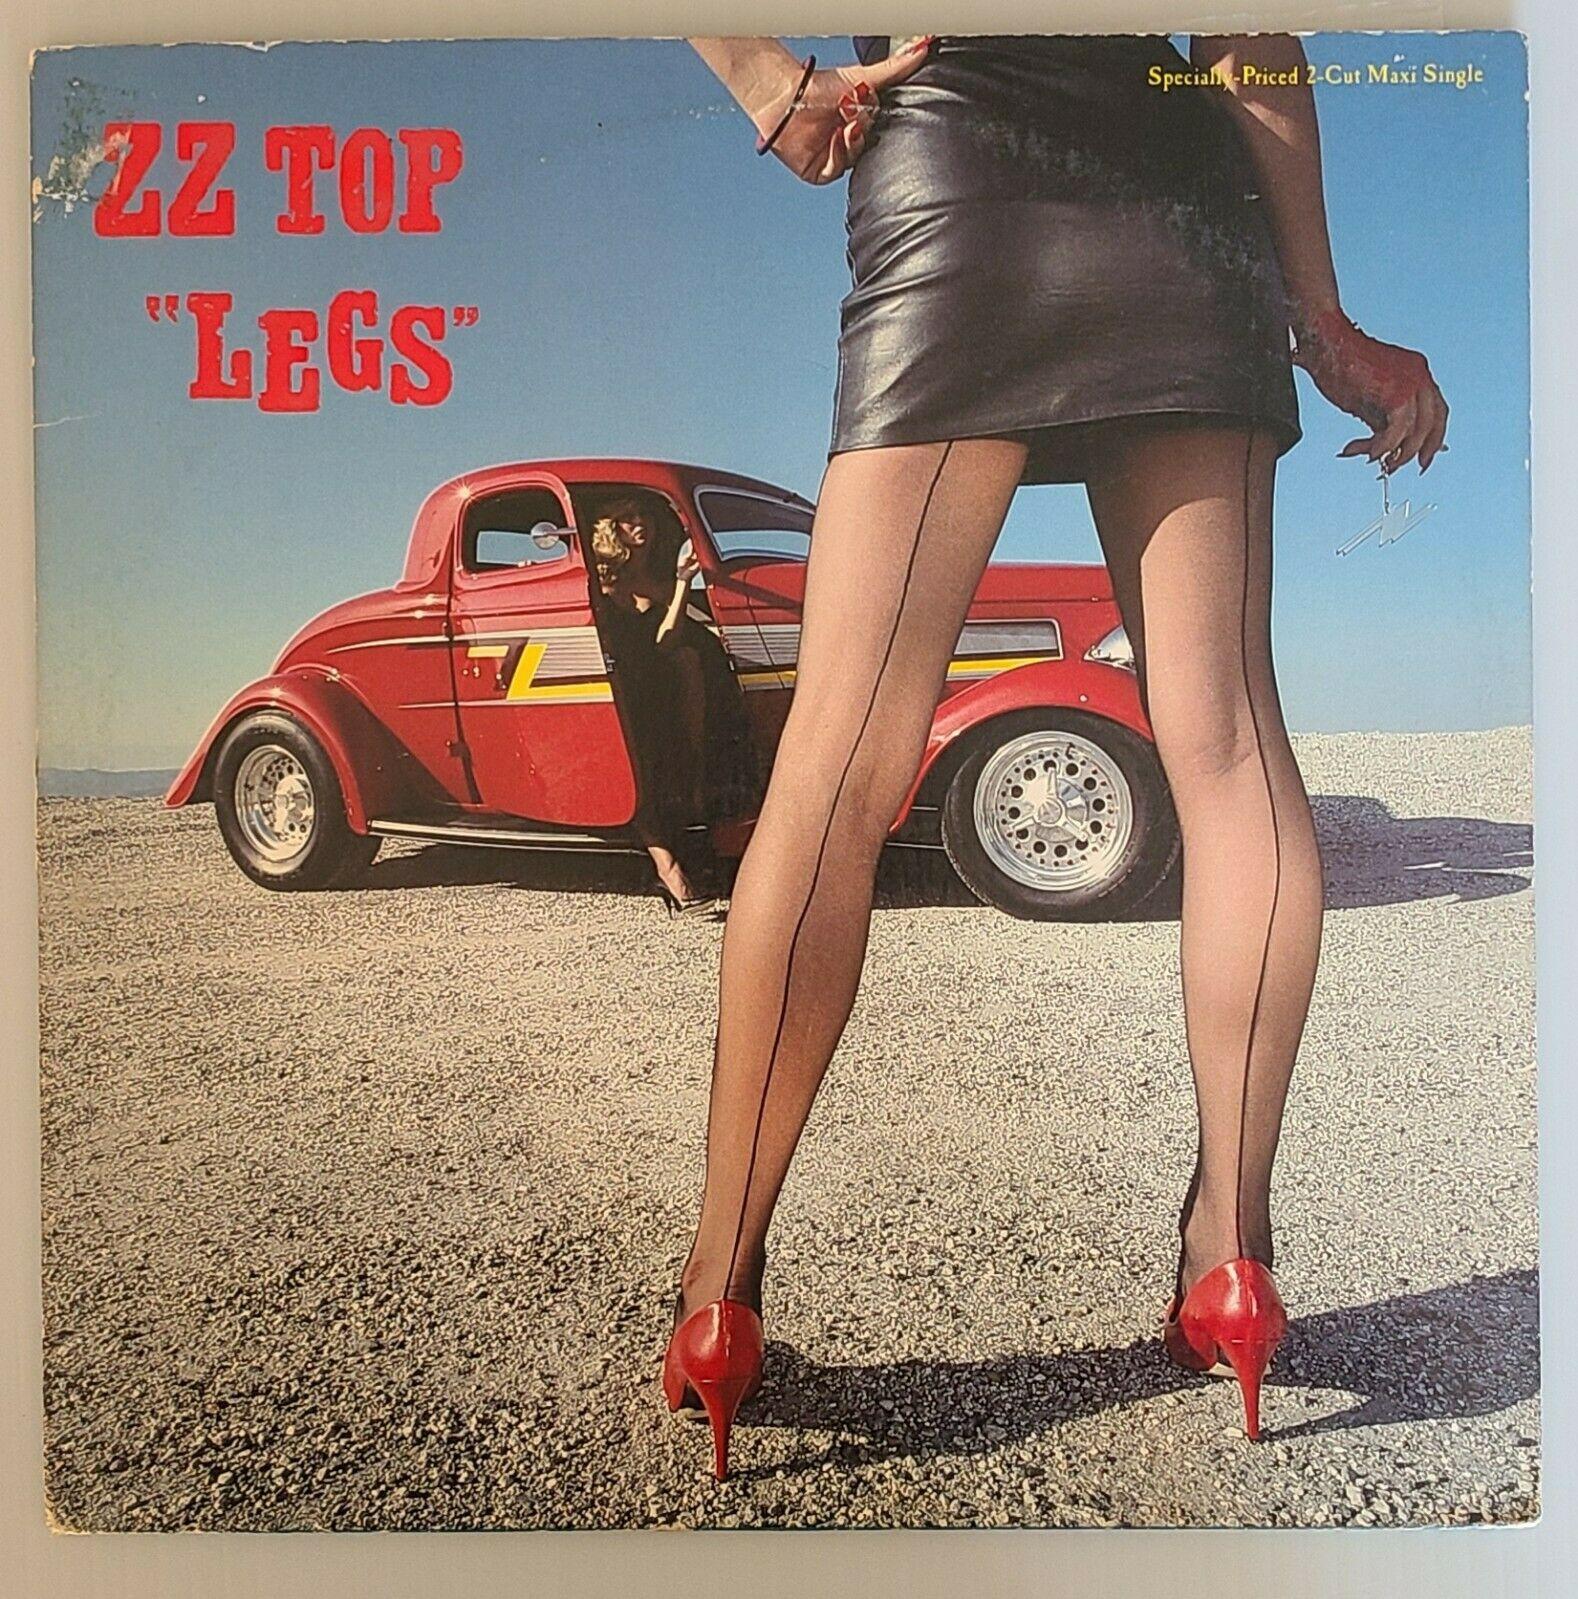 zz top album cover hot legs eliminator coupe